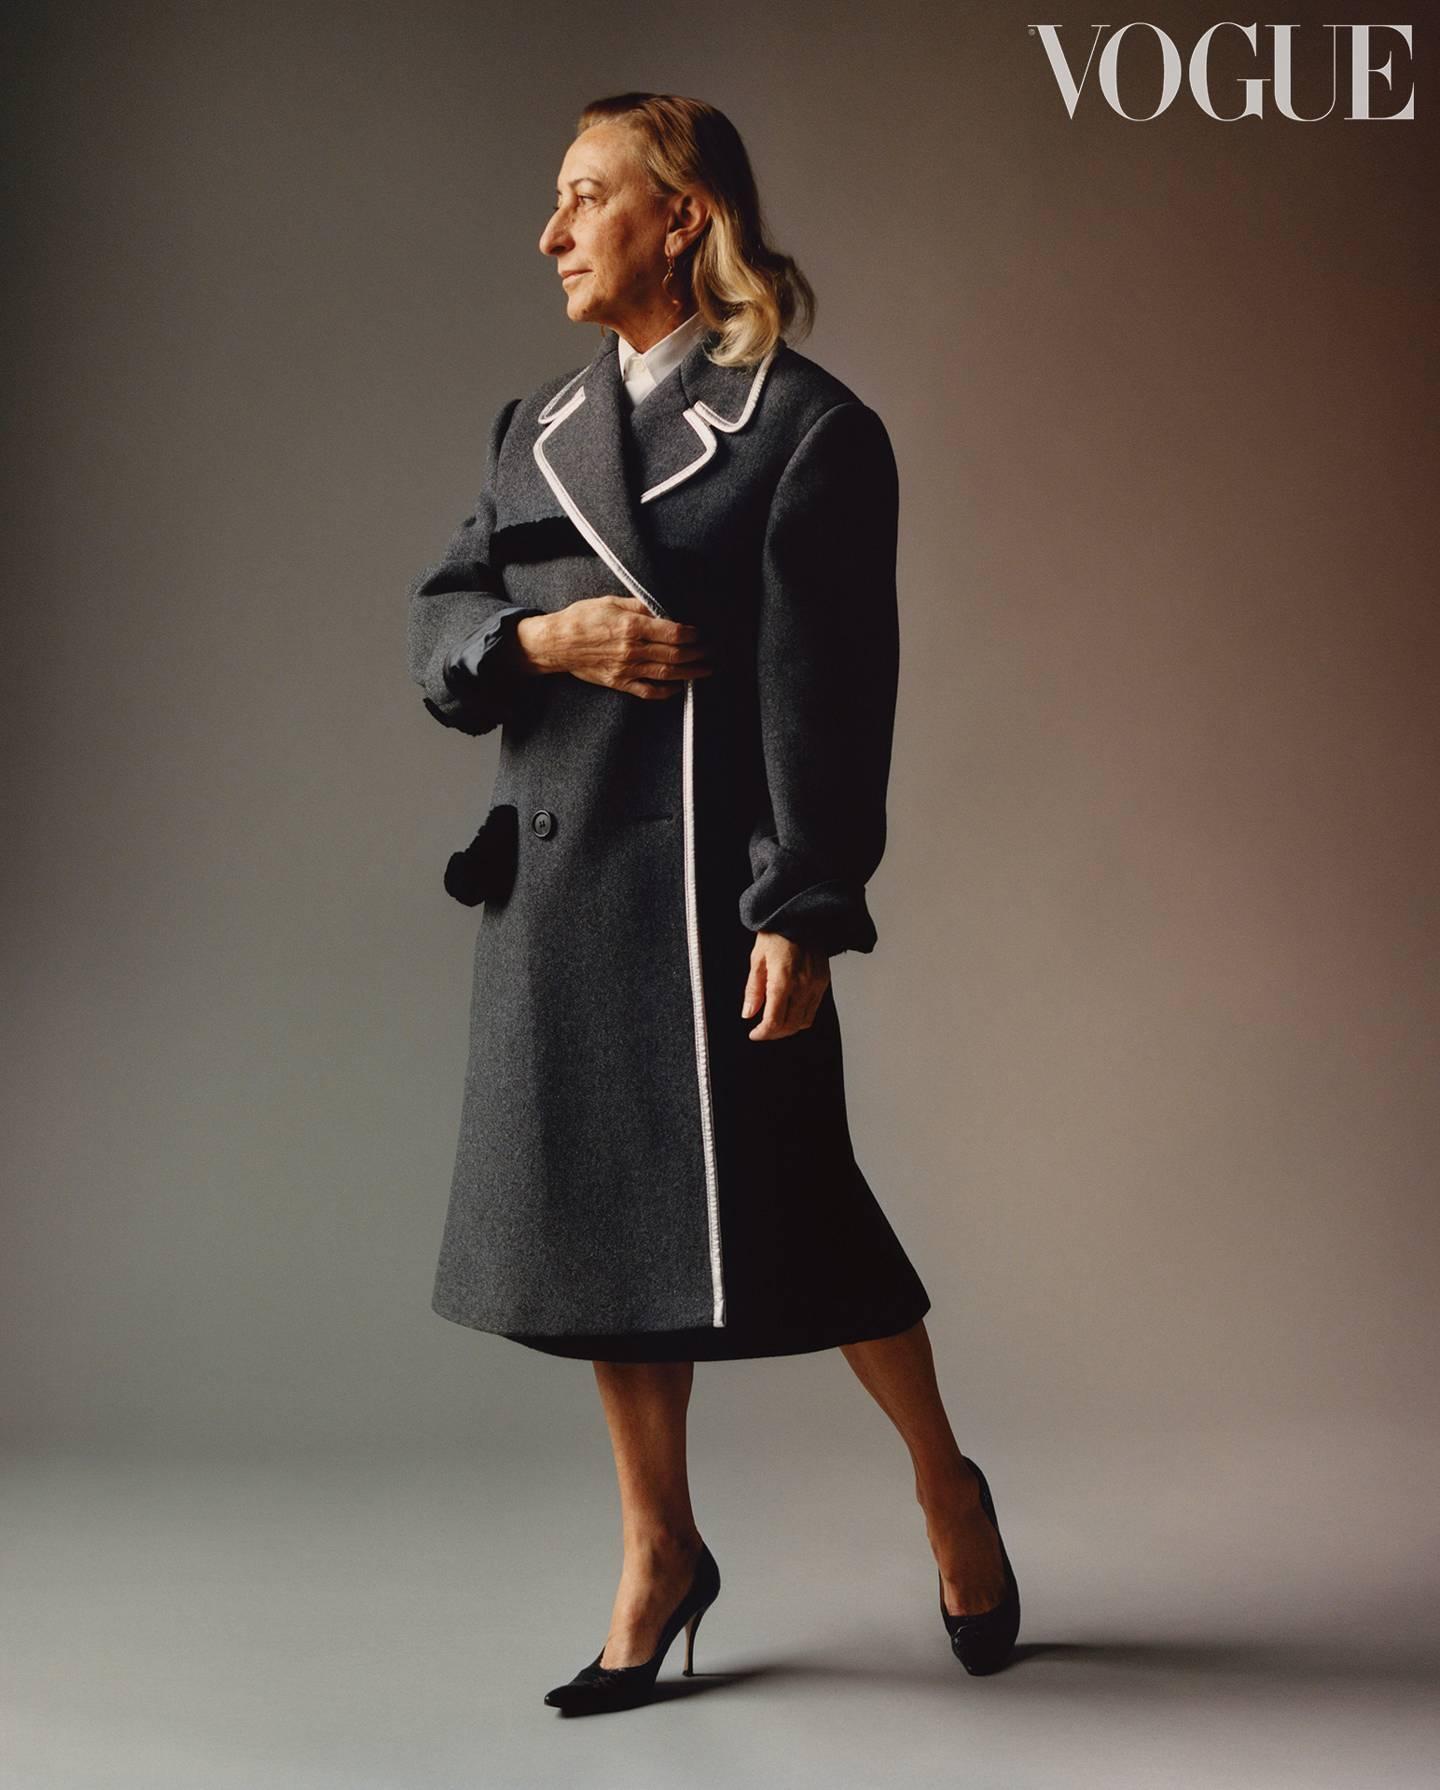 16a4b20765a2 Miuccia Prada: The Vogue Interview | British Vogue